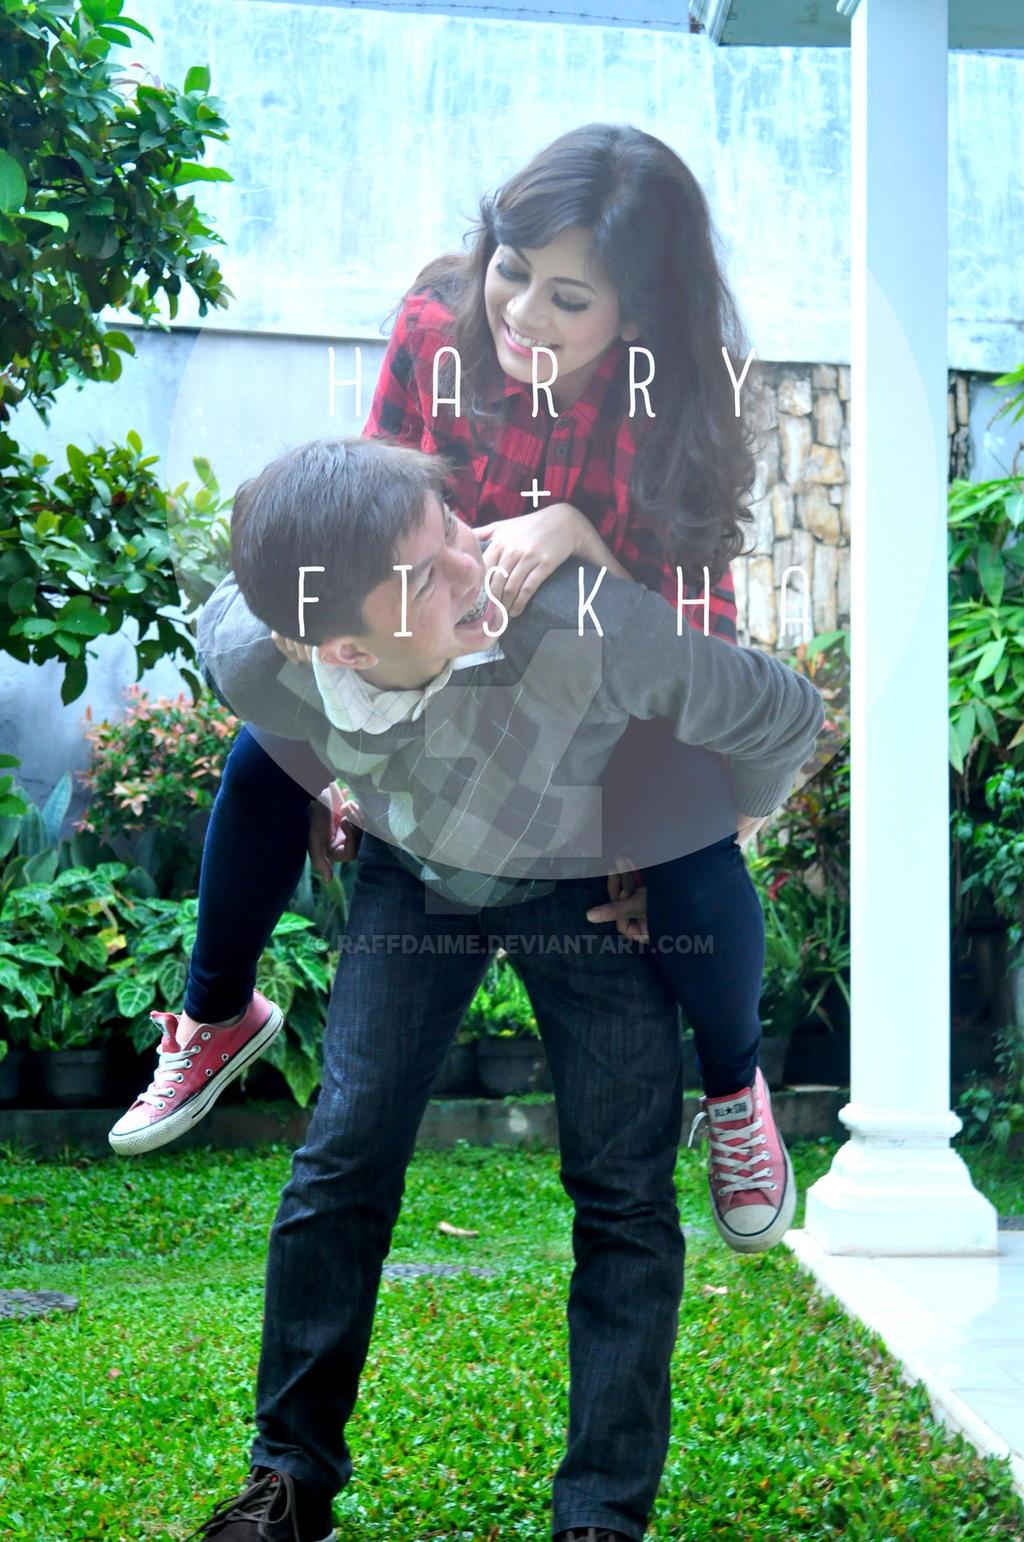 Harry + Fiskha by raffdaime